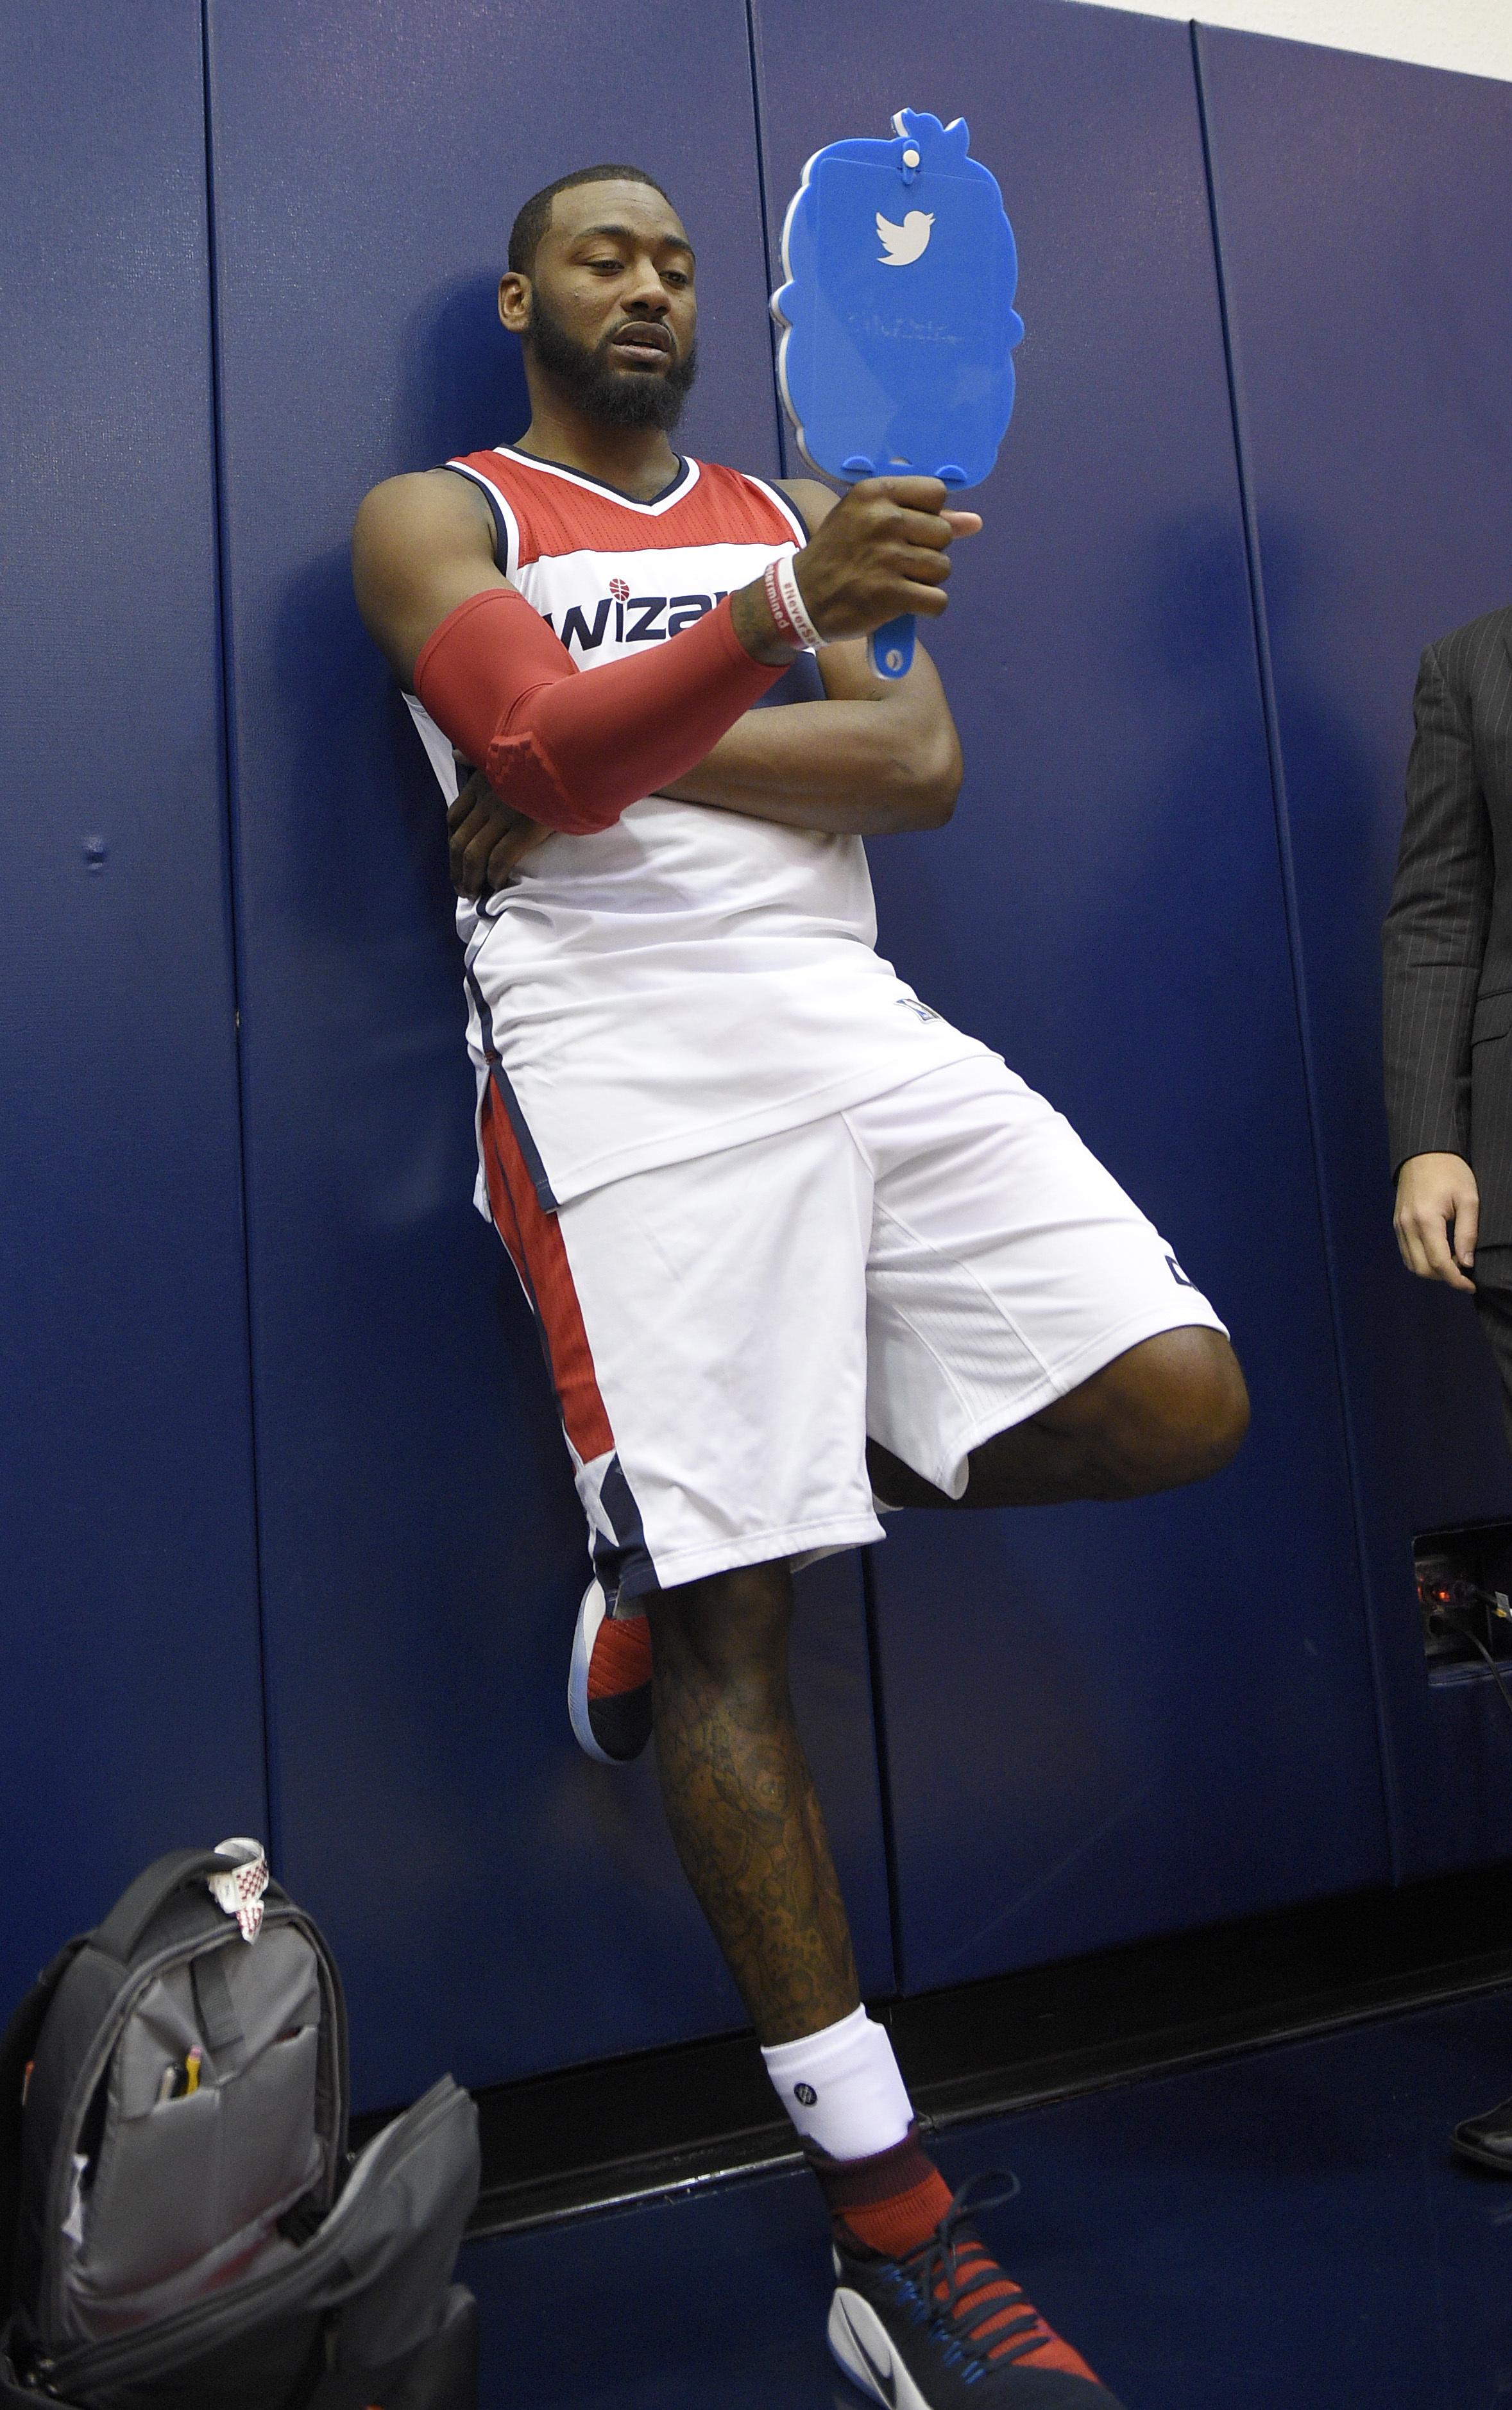 Wizards_media_day_basketball.jpeg-15a0e